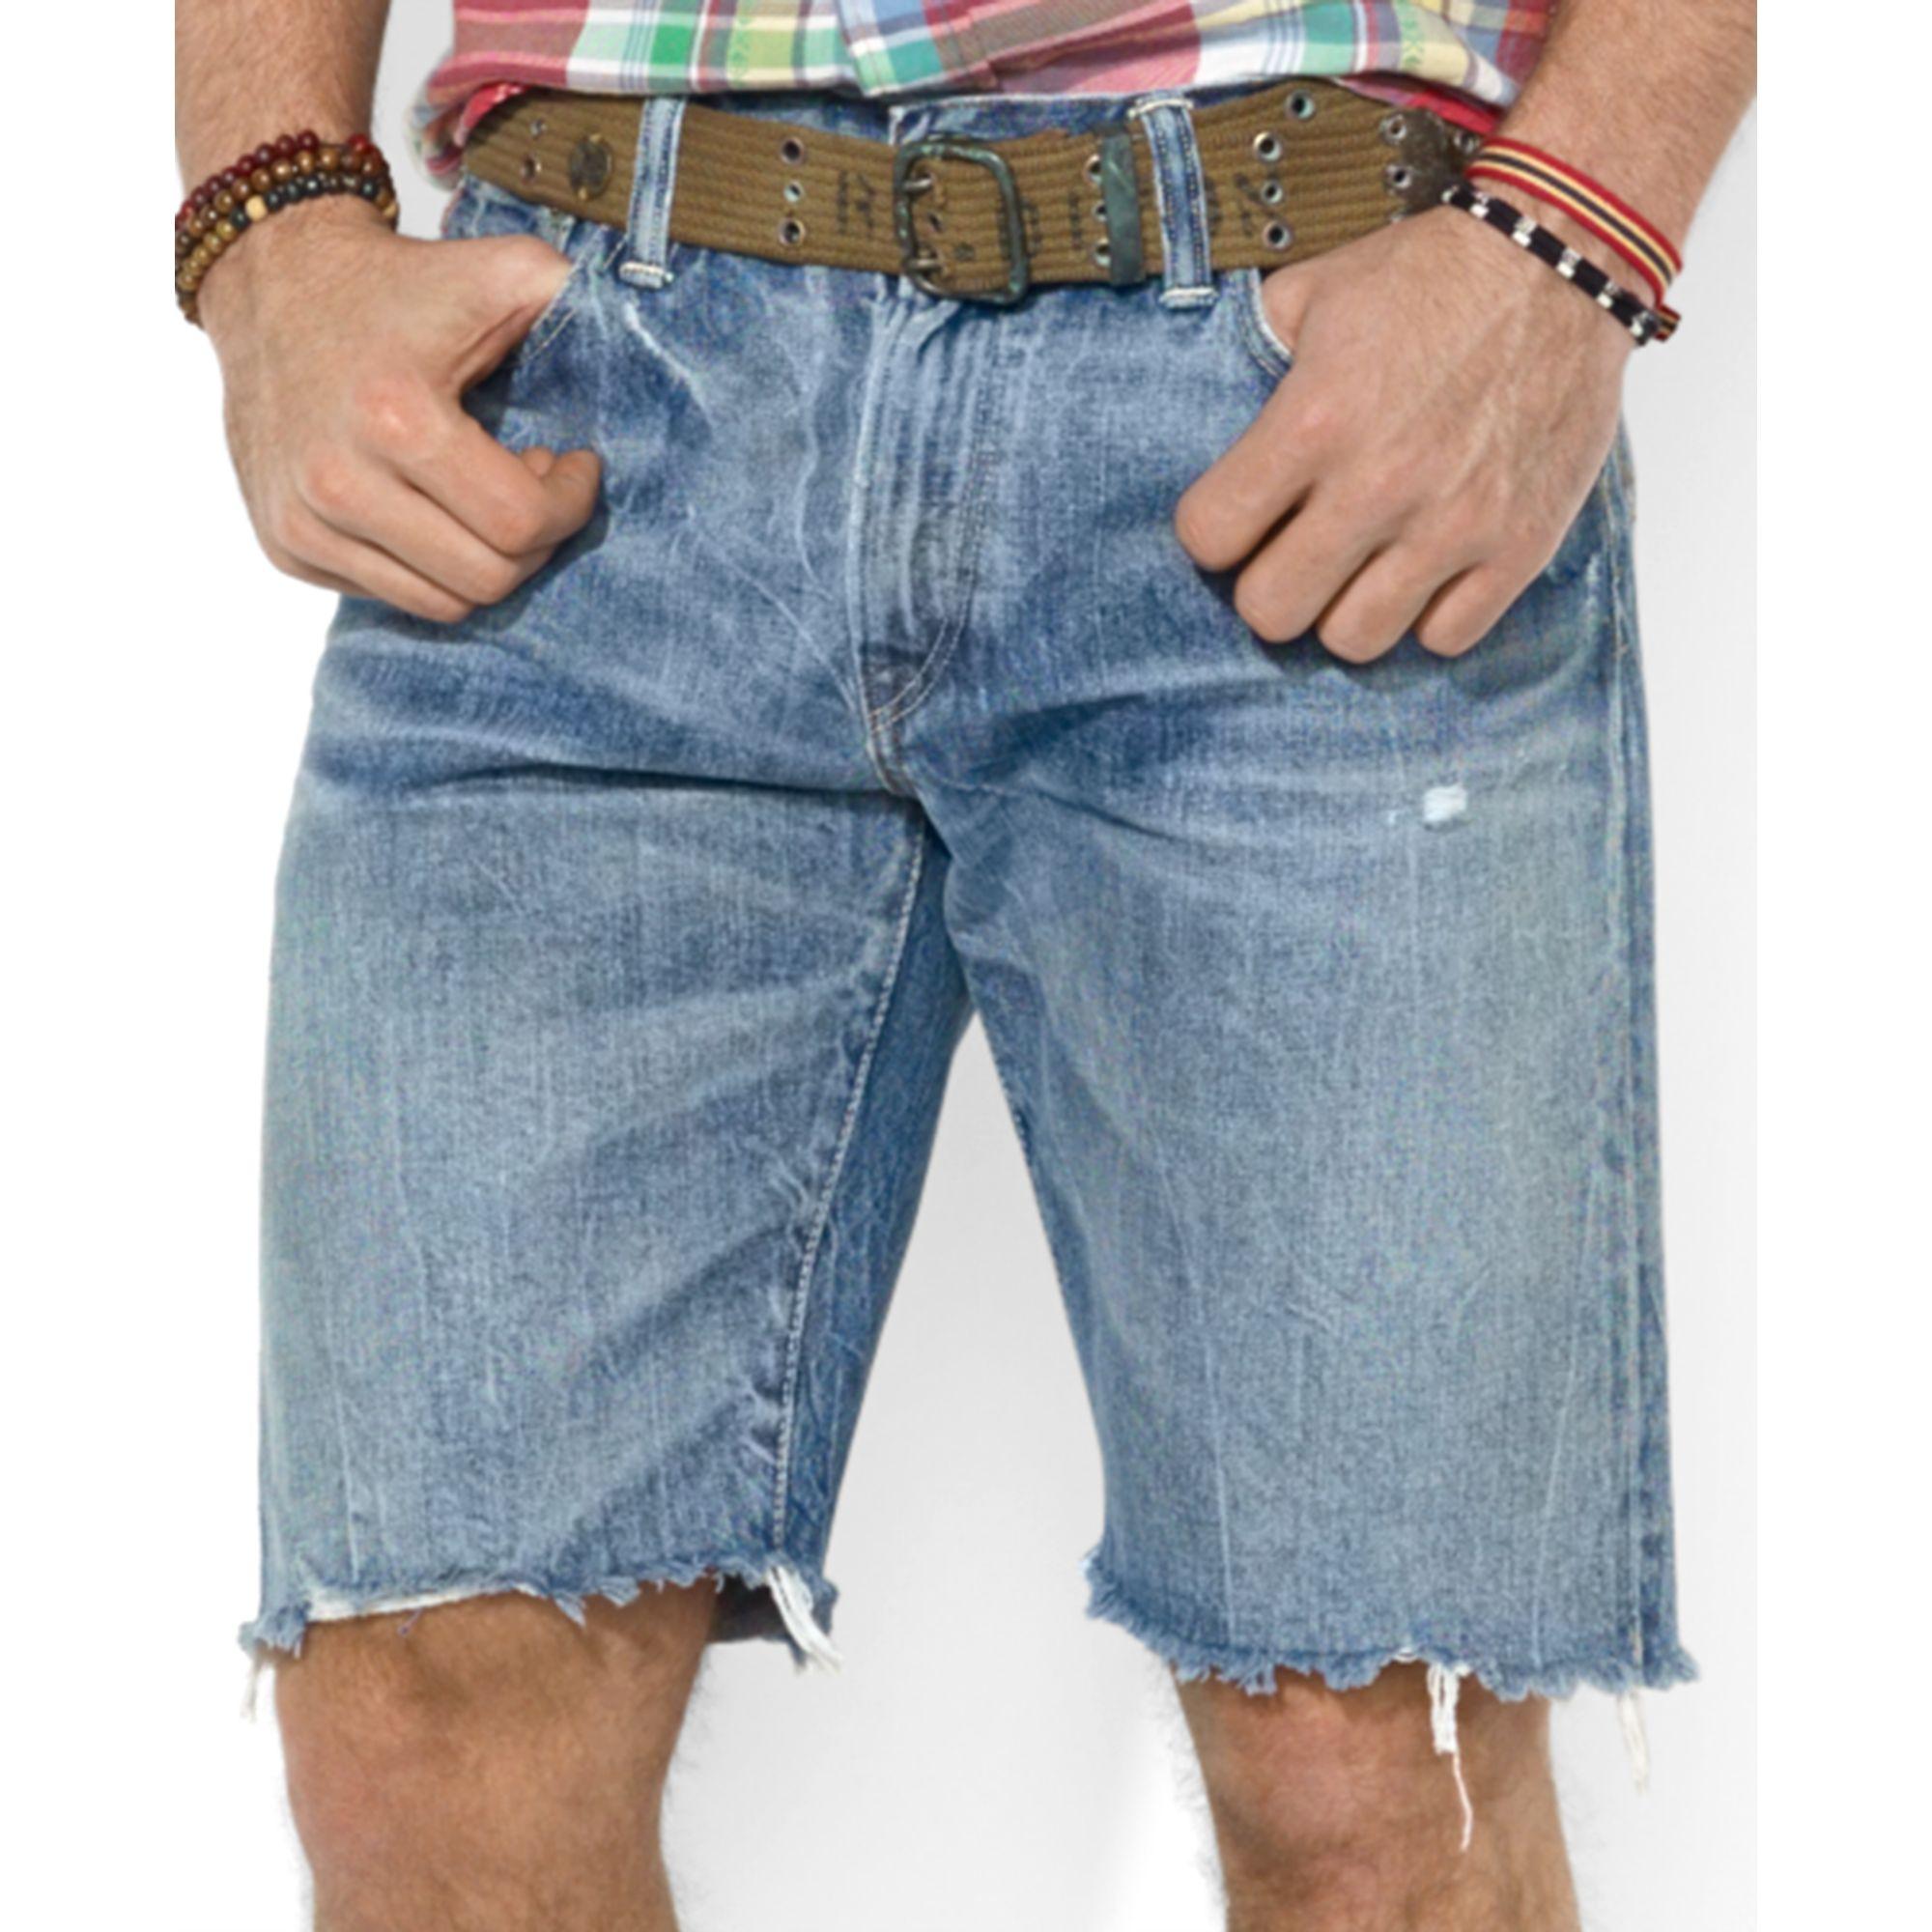 213b56724 Polo Ralph Lauren Polo Indigodyed Denim Cutoff Shorts in Blue for ...